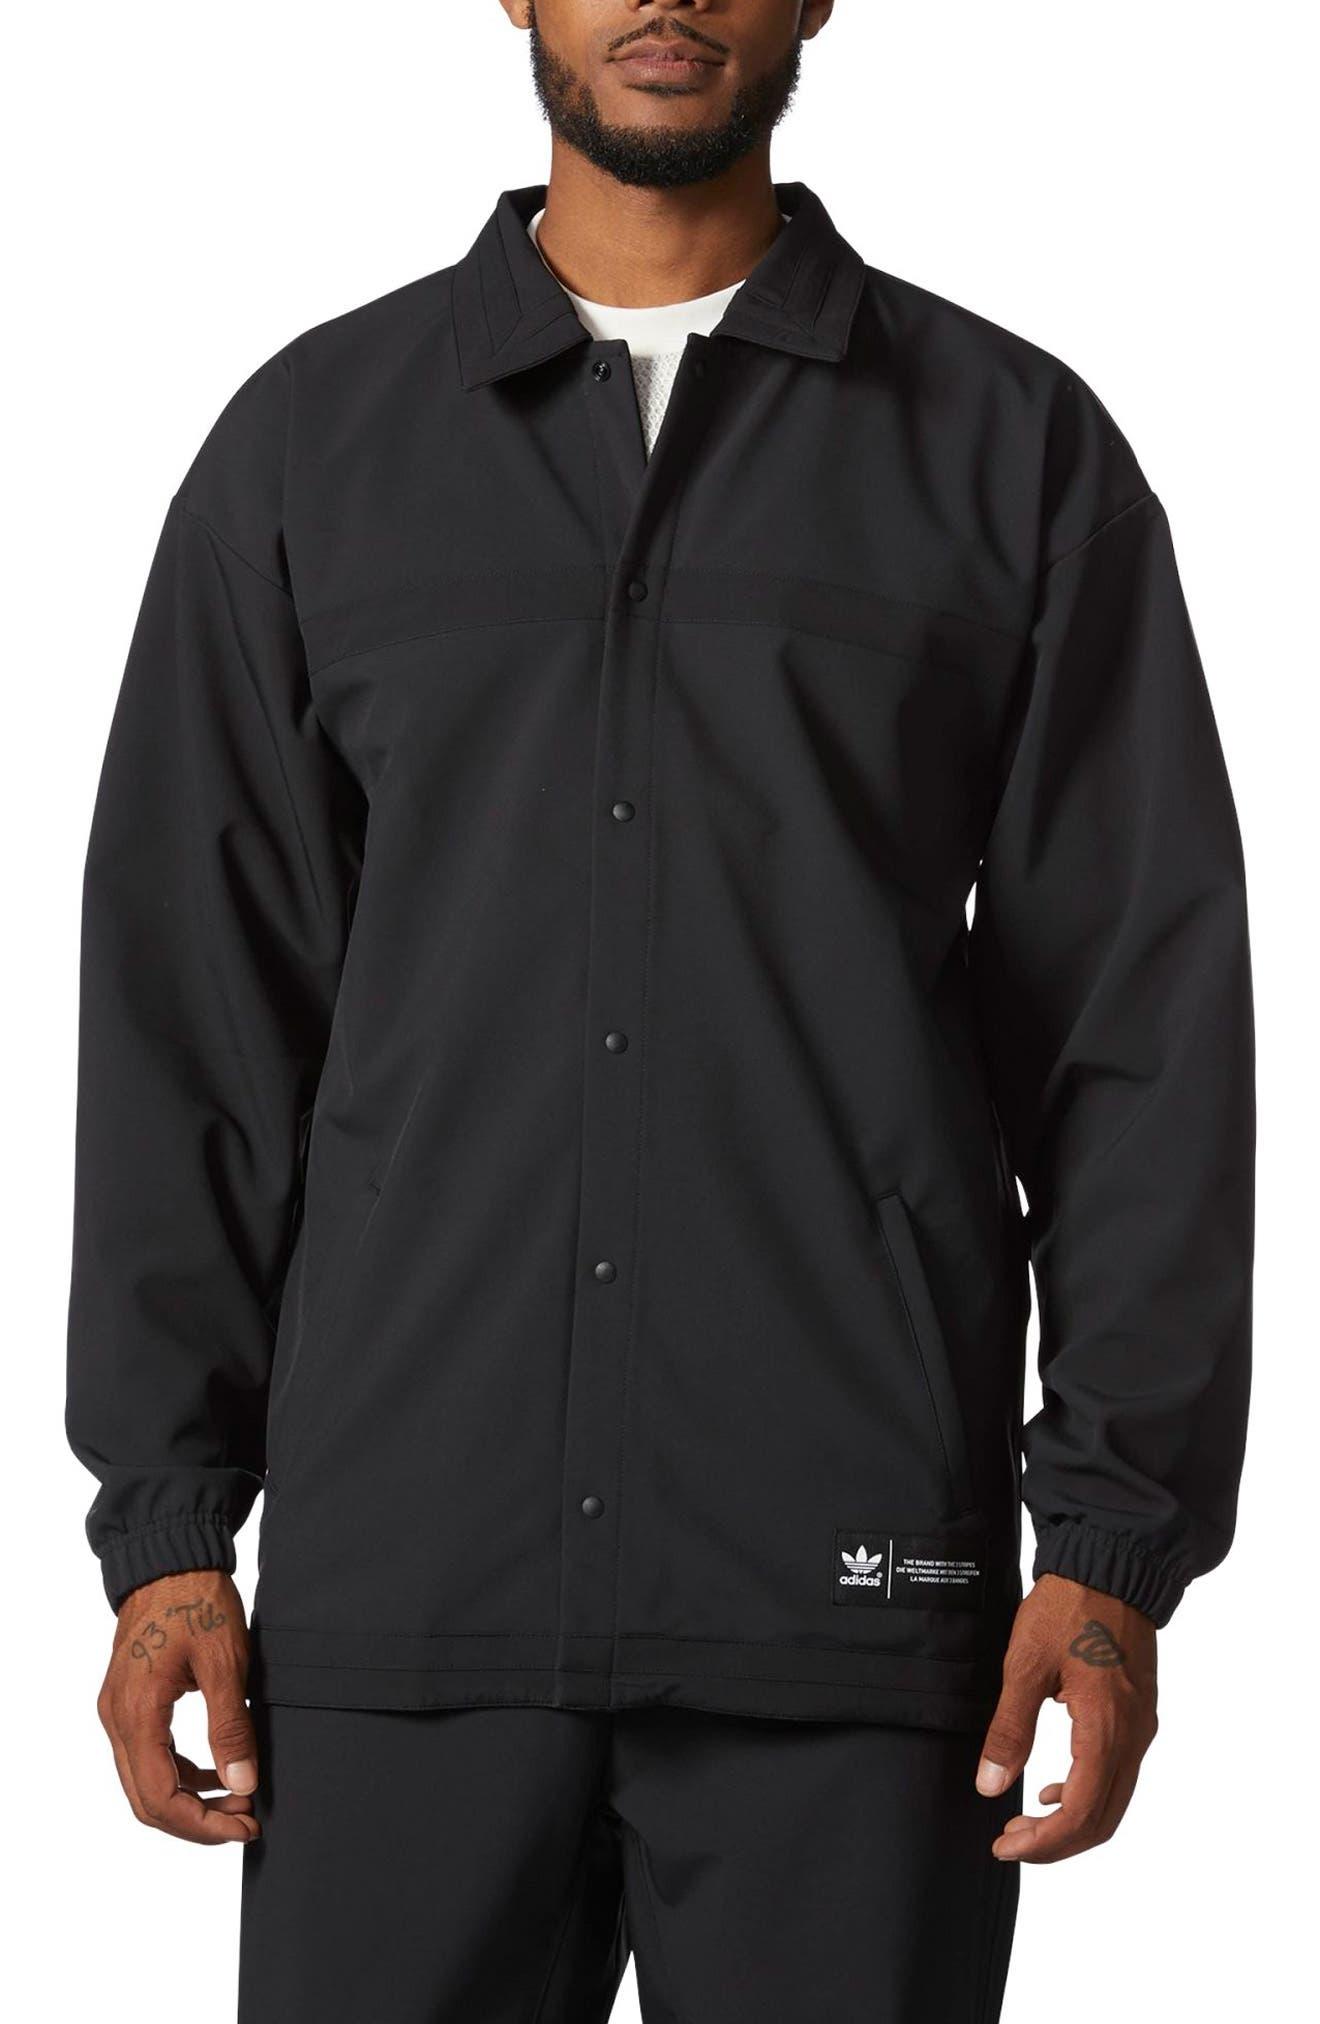 CR8 Coach's Jacket,                             Main thumbnail 1, color,                             Black